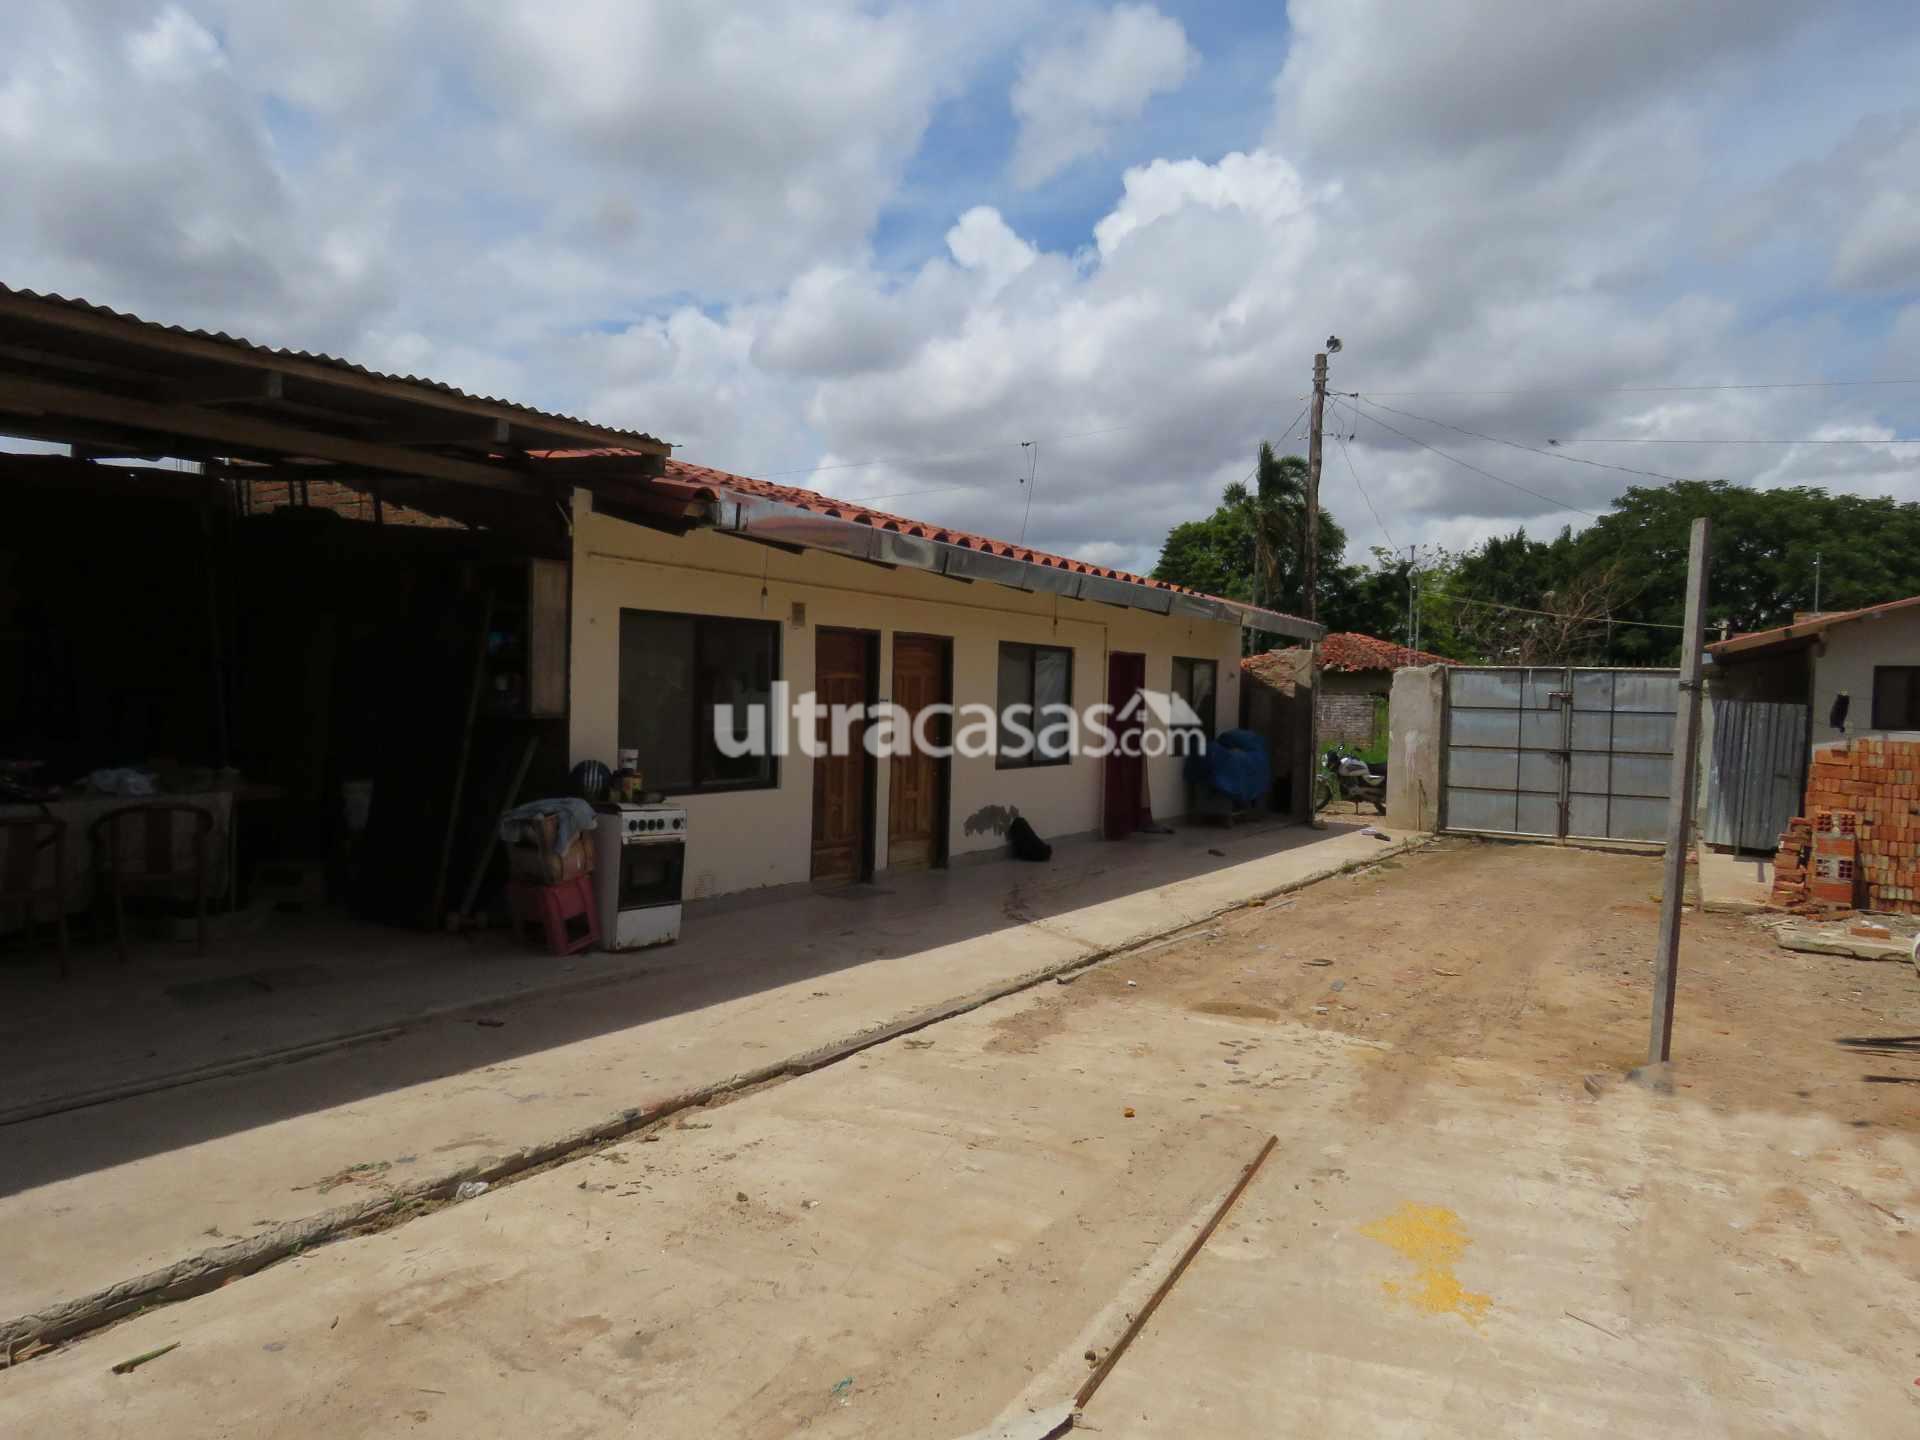 Casa en Venta AV BOLIVA CALLE 12 (BARRIO 24 DE JULIO)  Foto 1